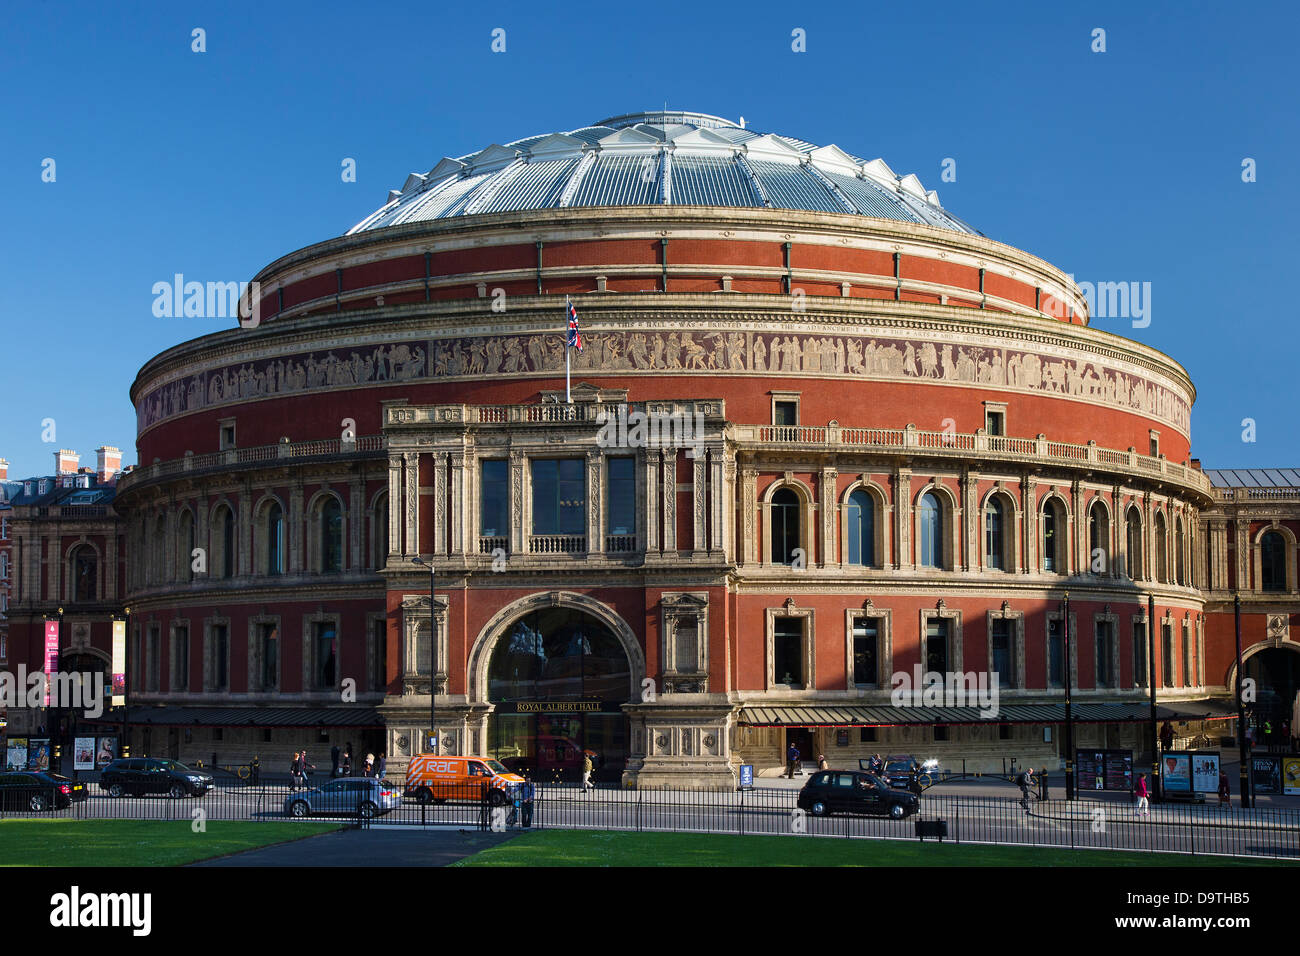 North side exterior of the Royal Albert Hall, Concert Hall, Kensington, London, UK - Stock Image